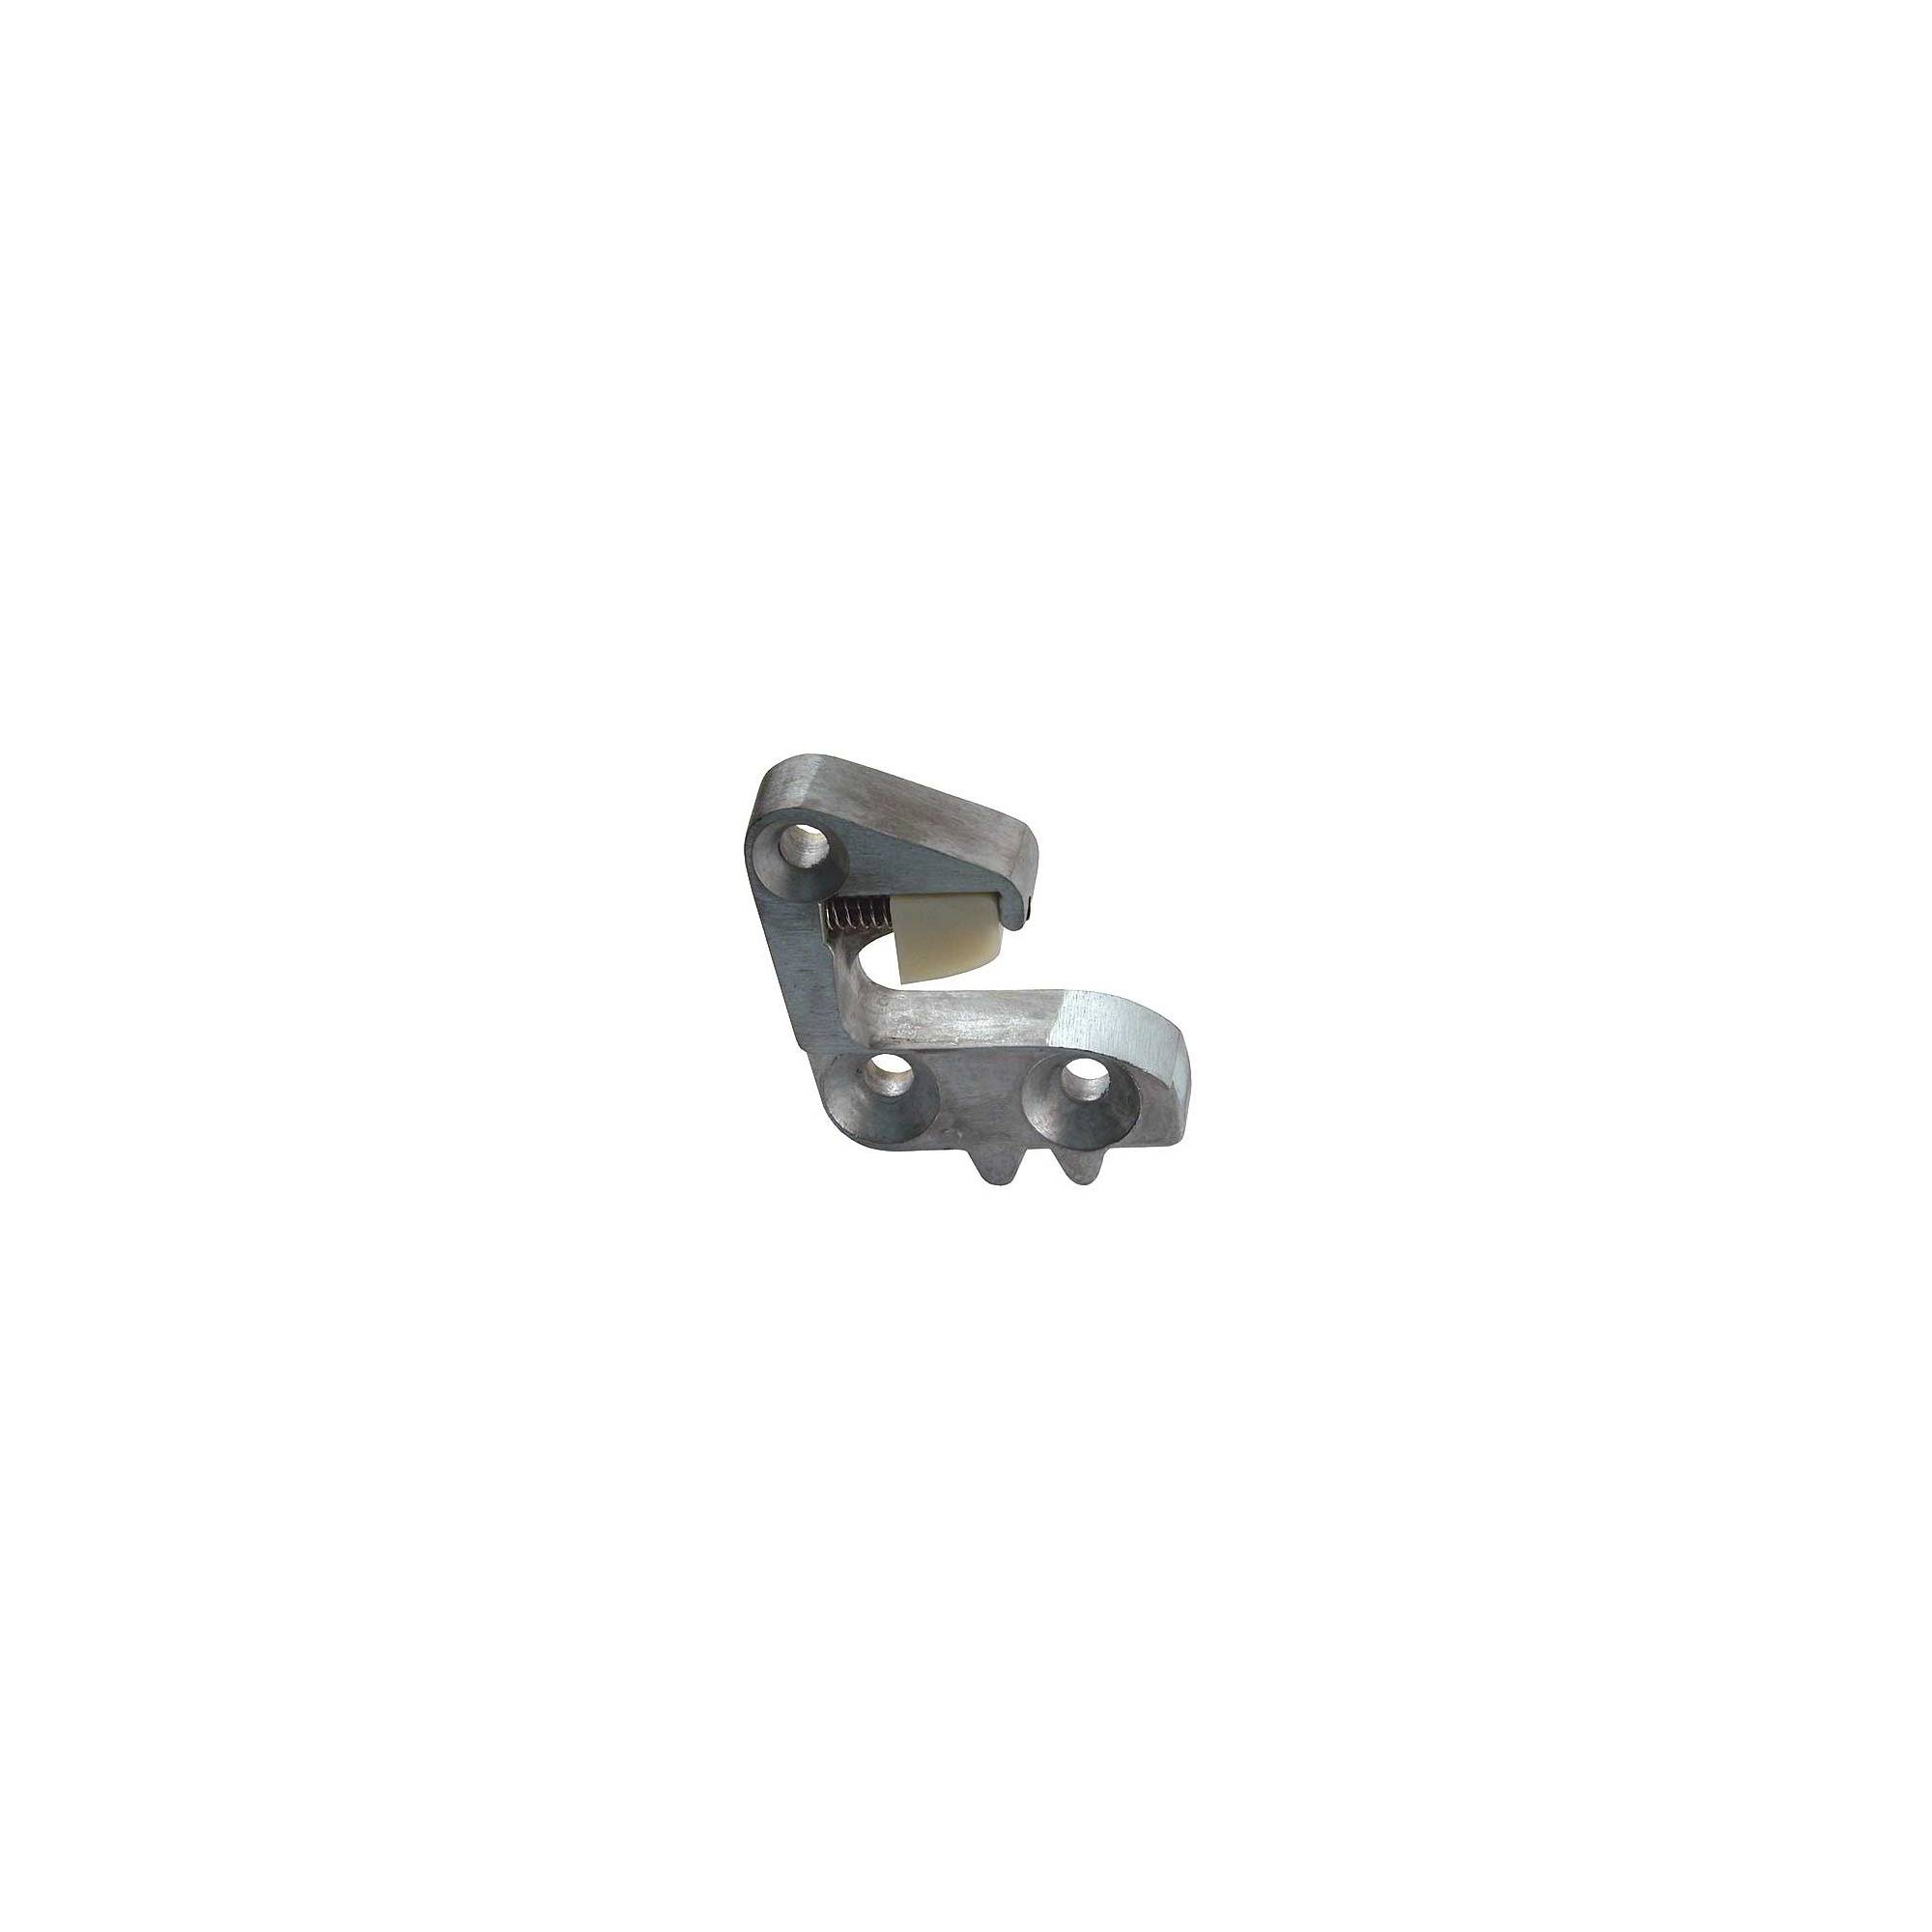 Includes Insert Thunderbird Door Latch Striker Plate MACs Auto Parts 66-28931 Left